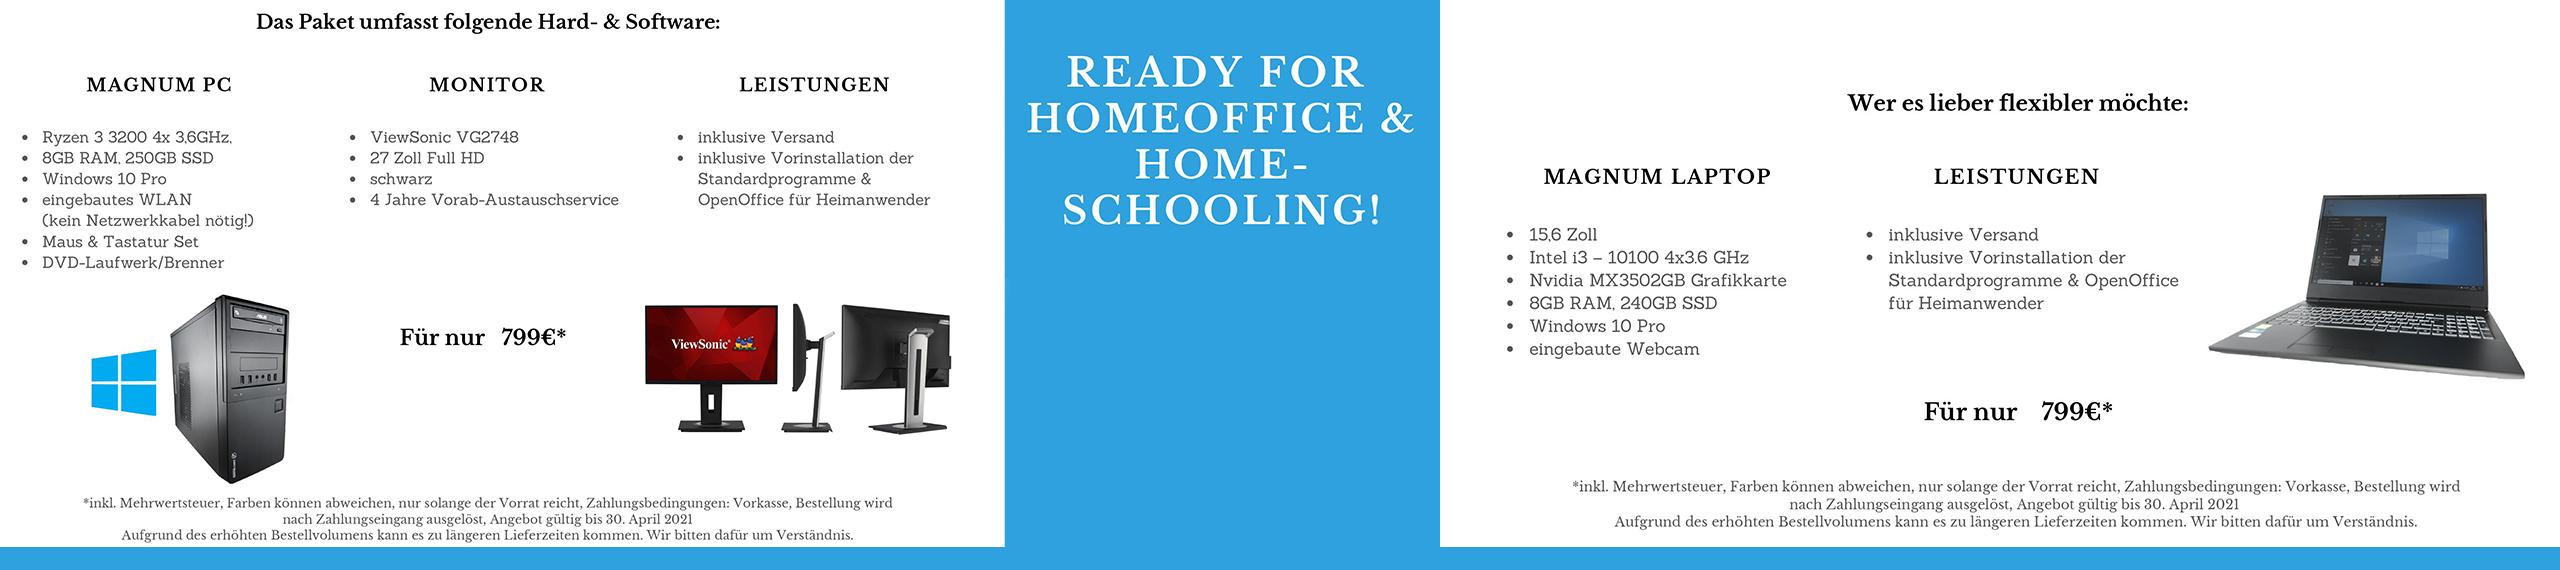 Magnum GmbH Aktion Homeschooling